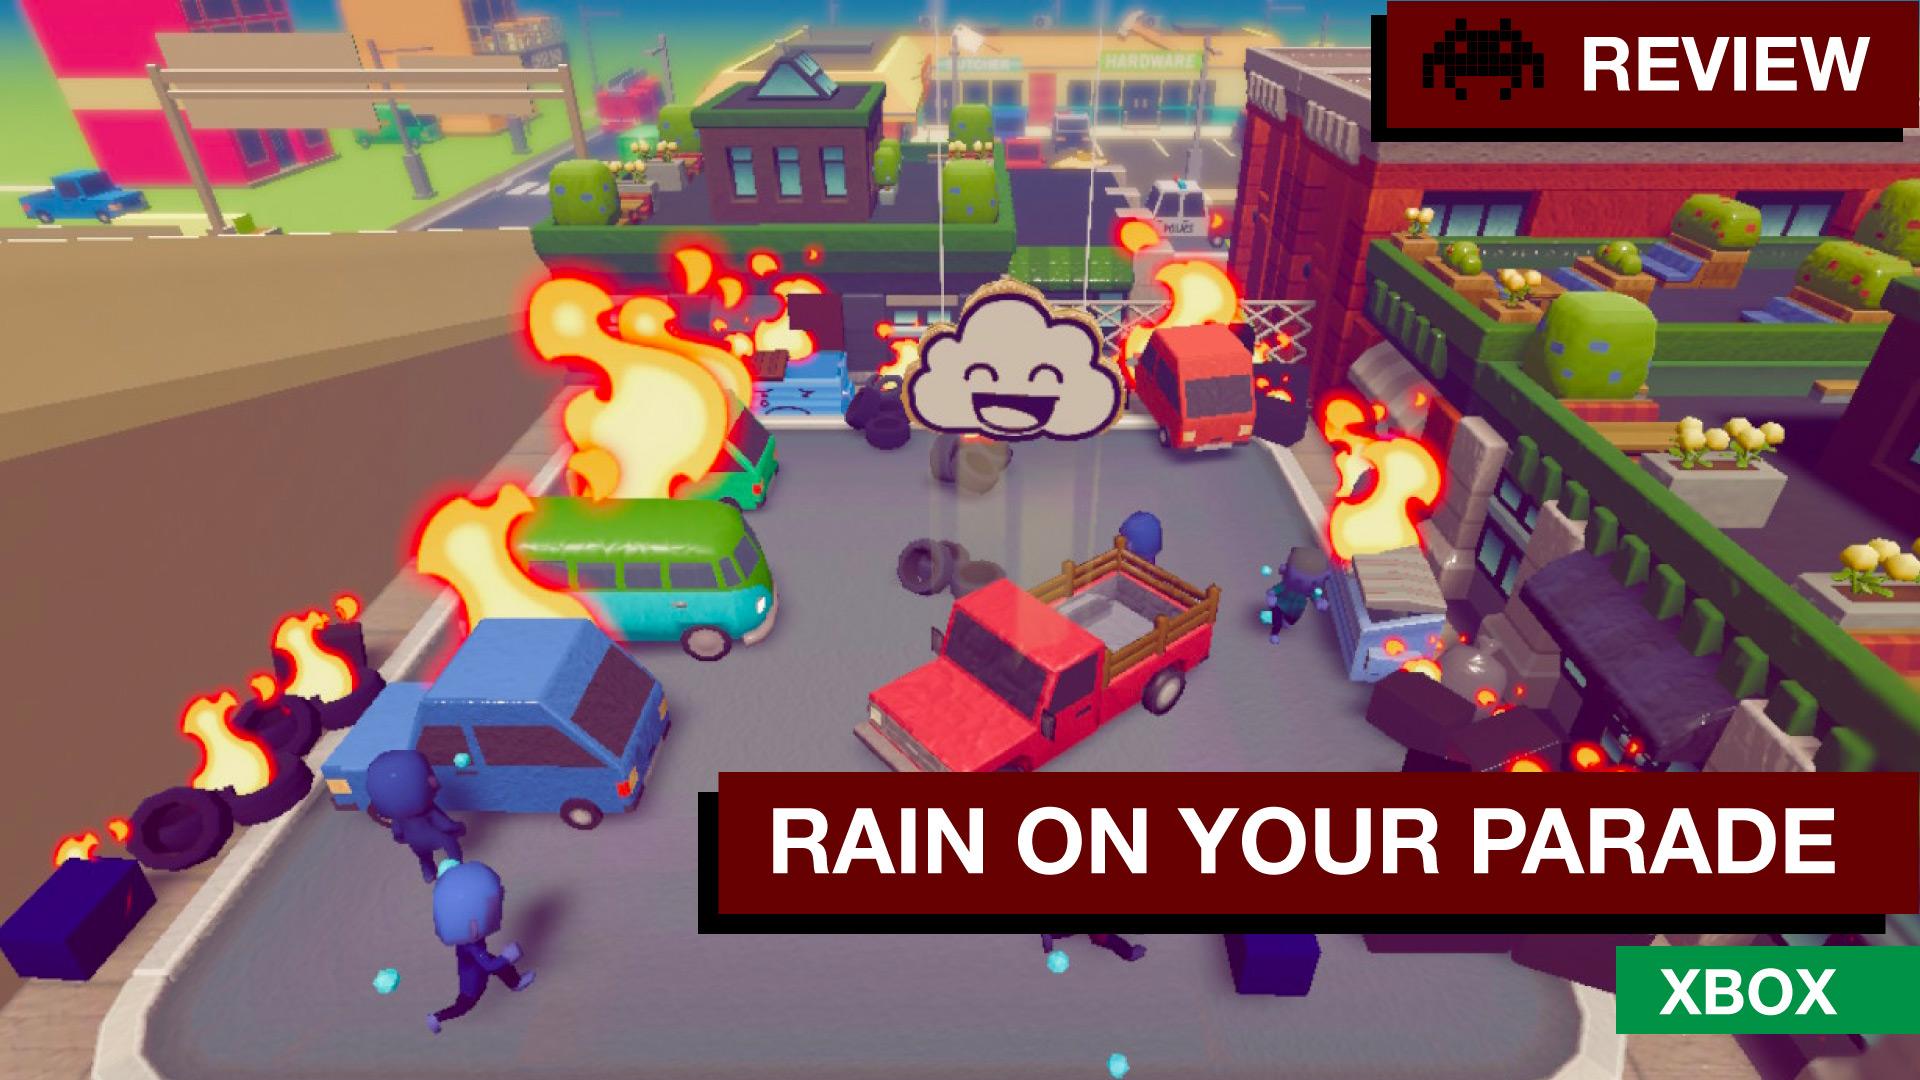 Rain-on-Your-Parade-xbox